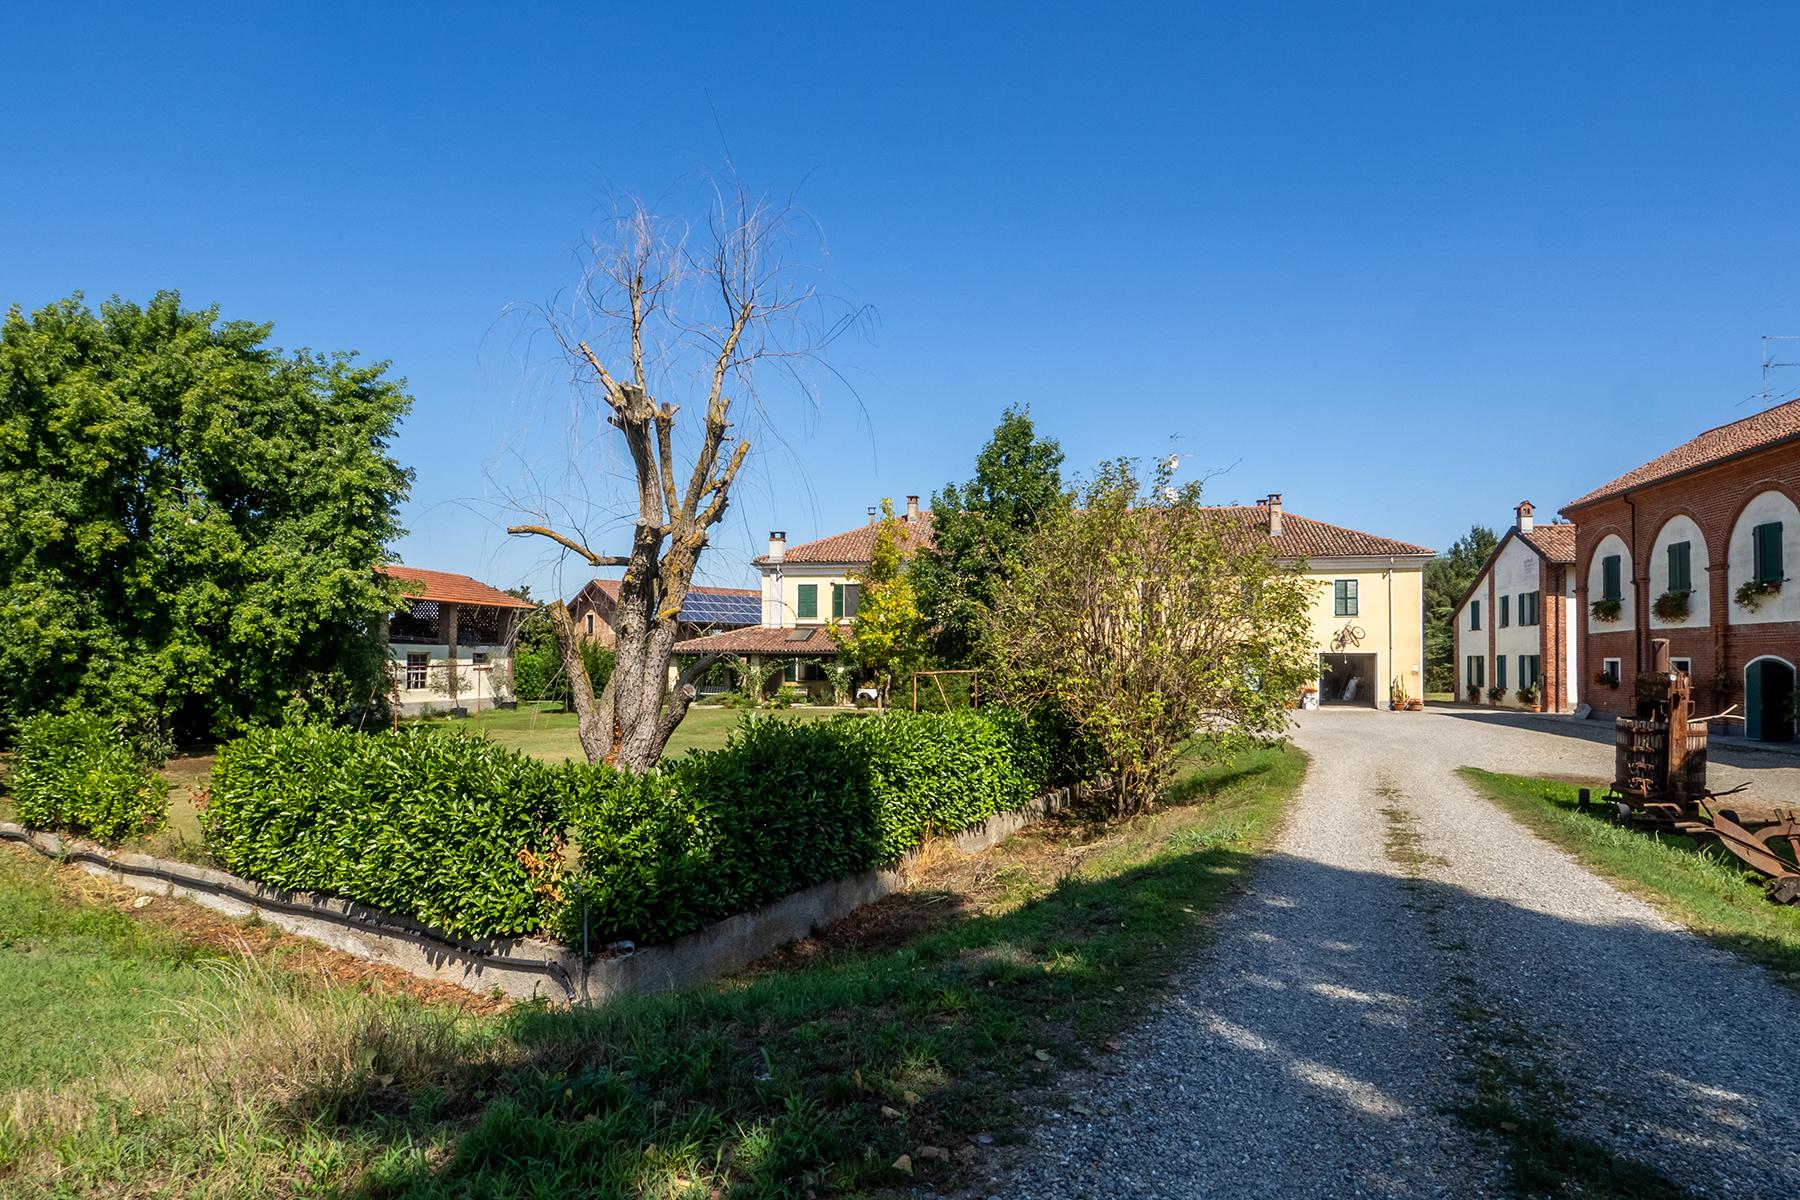 Rustico in Vendita a Valenza: 5 locali, 1800 mq - Foto 26